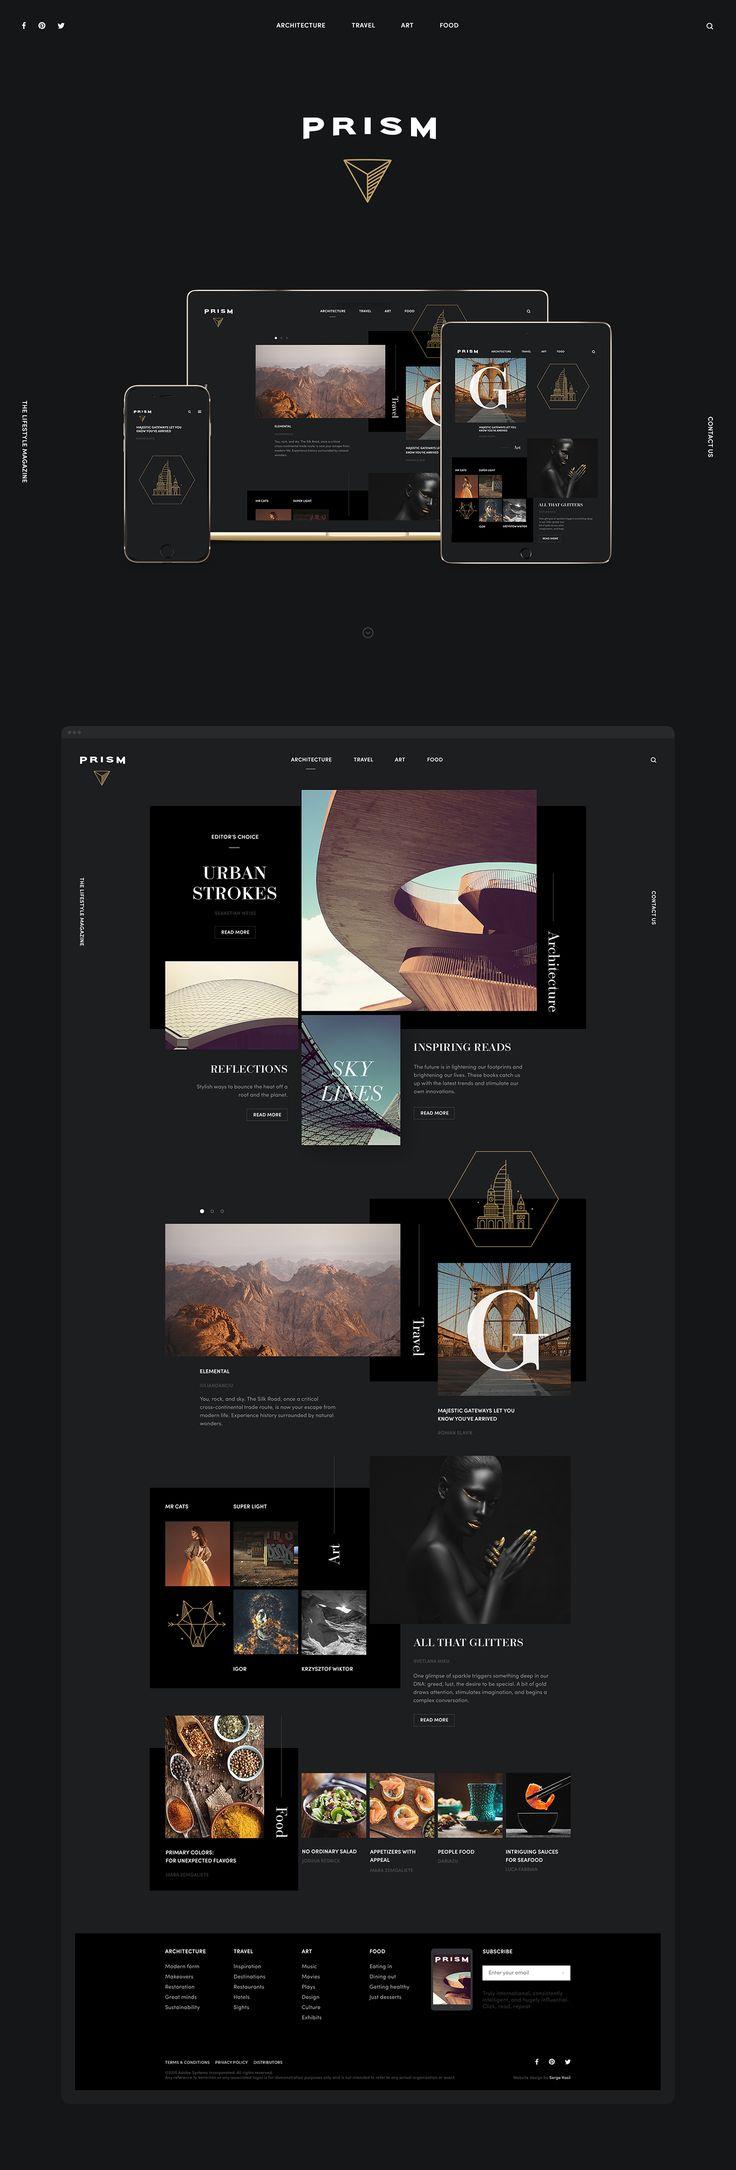 Official Showcase Website for Adobe   Abduzeedo Design Inspiration